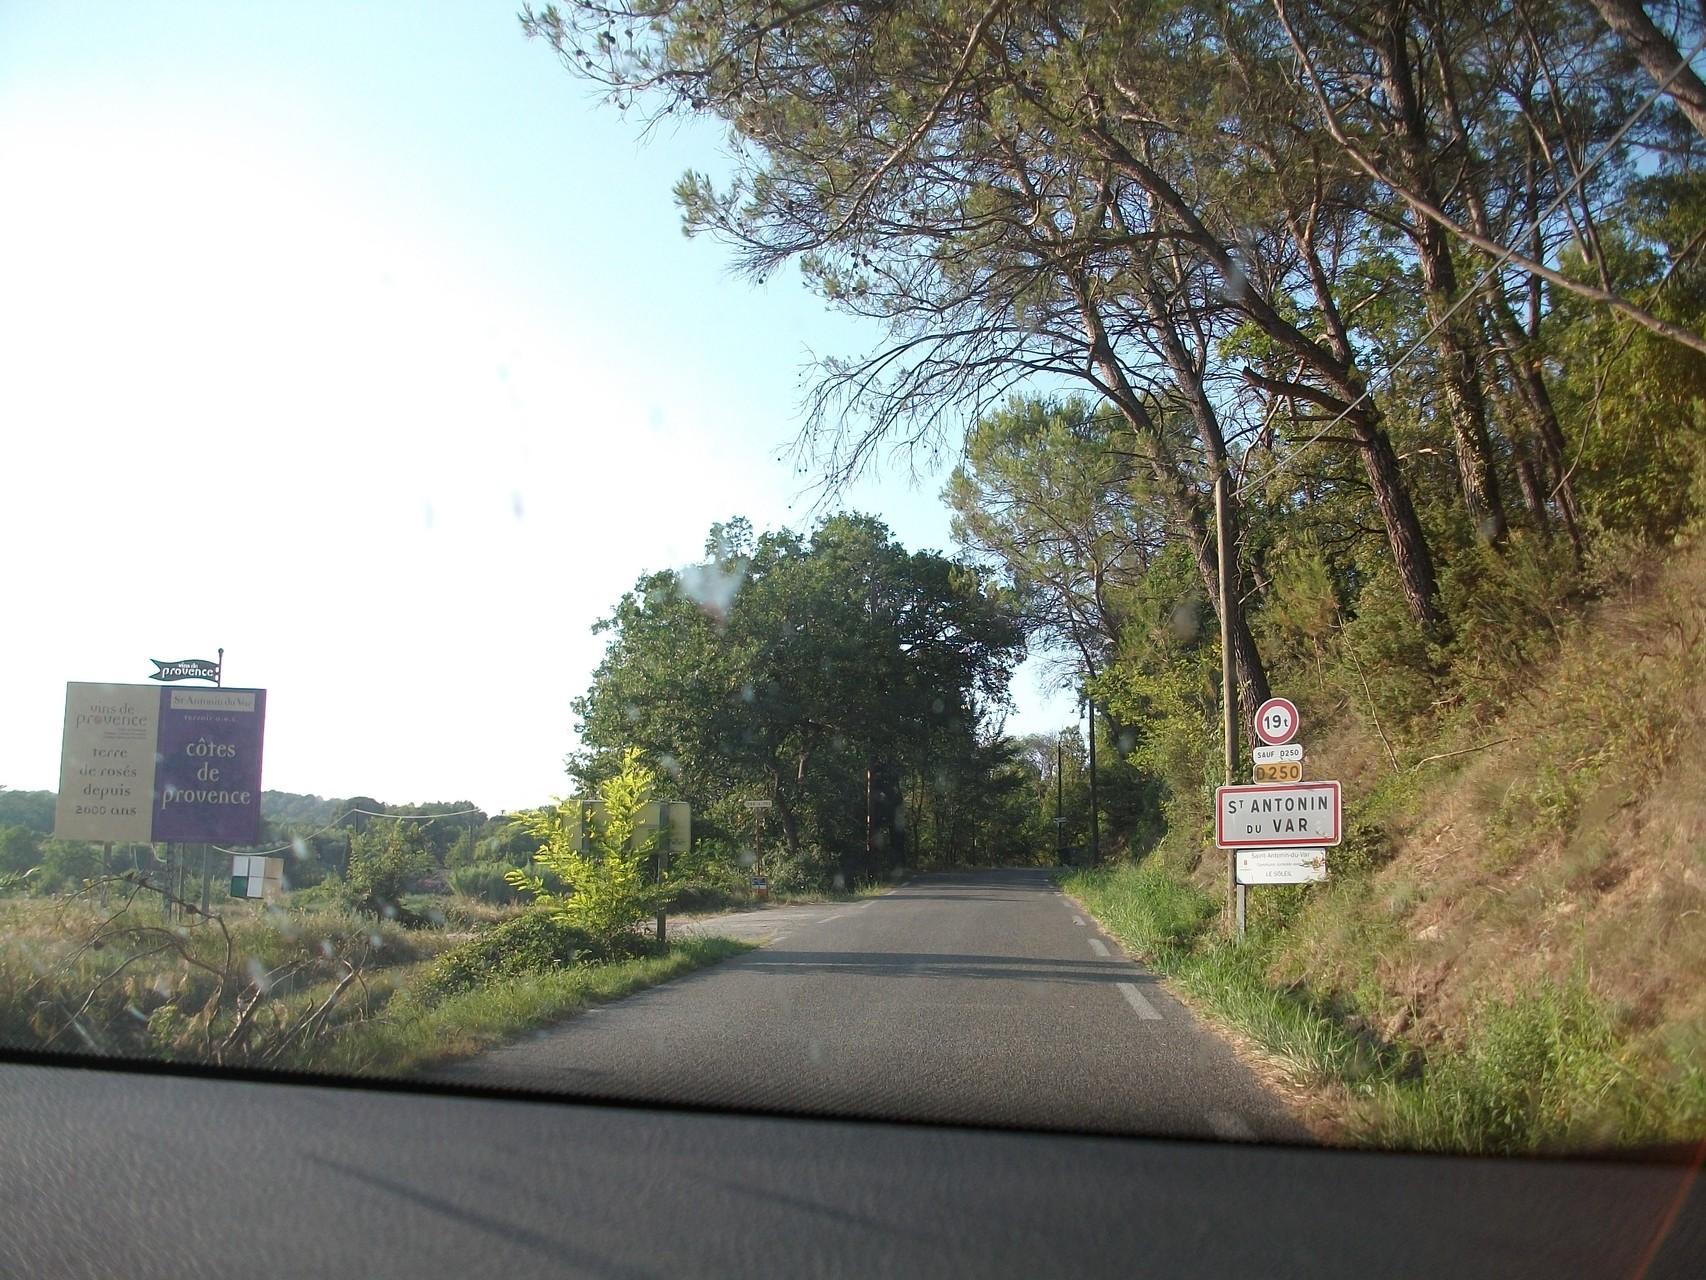 St.Antonin-du-Var